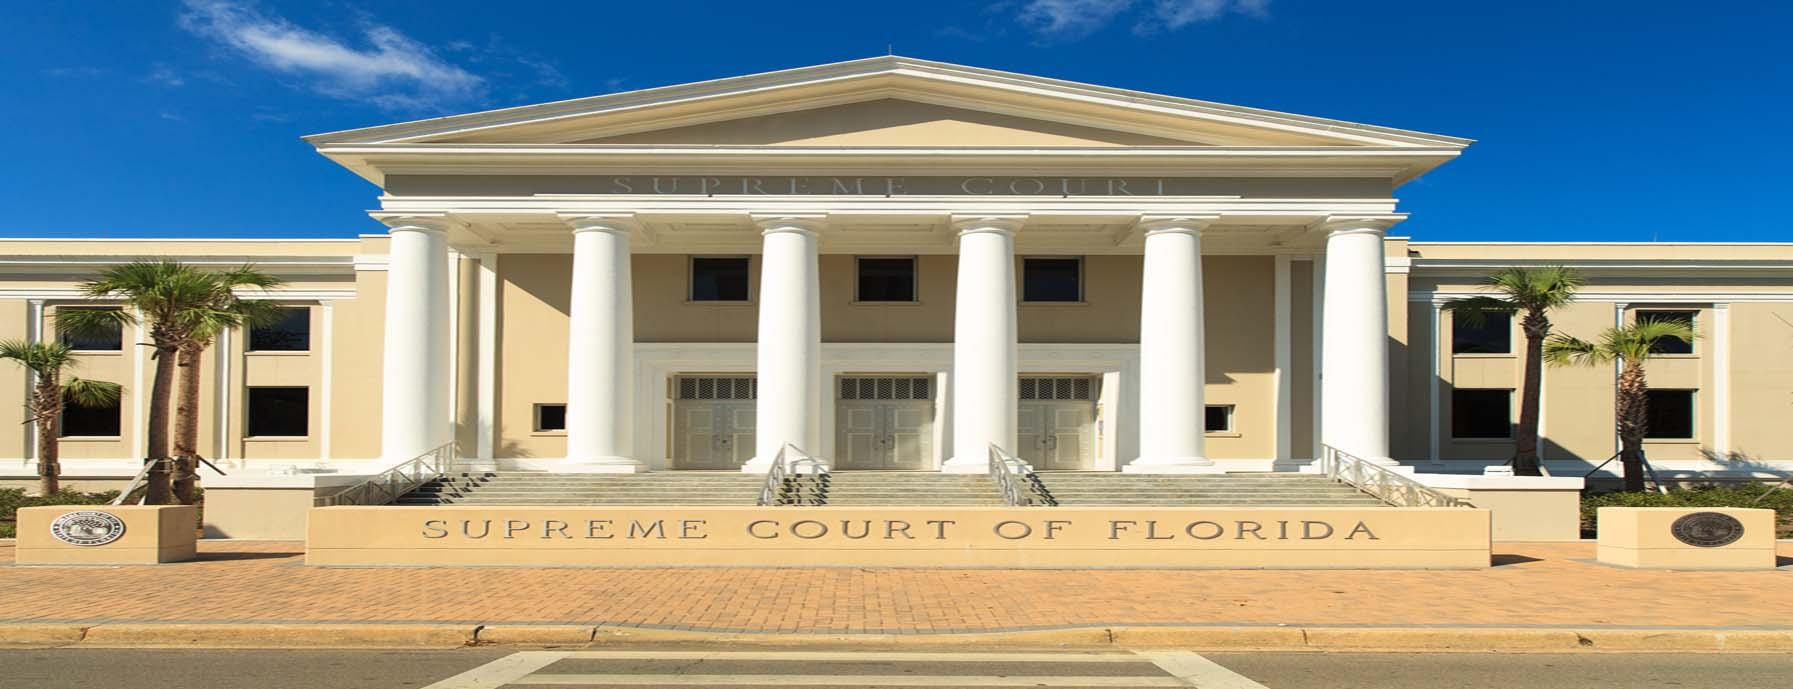 courthouse-1793-Fotolia_51114722_M